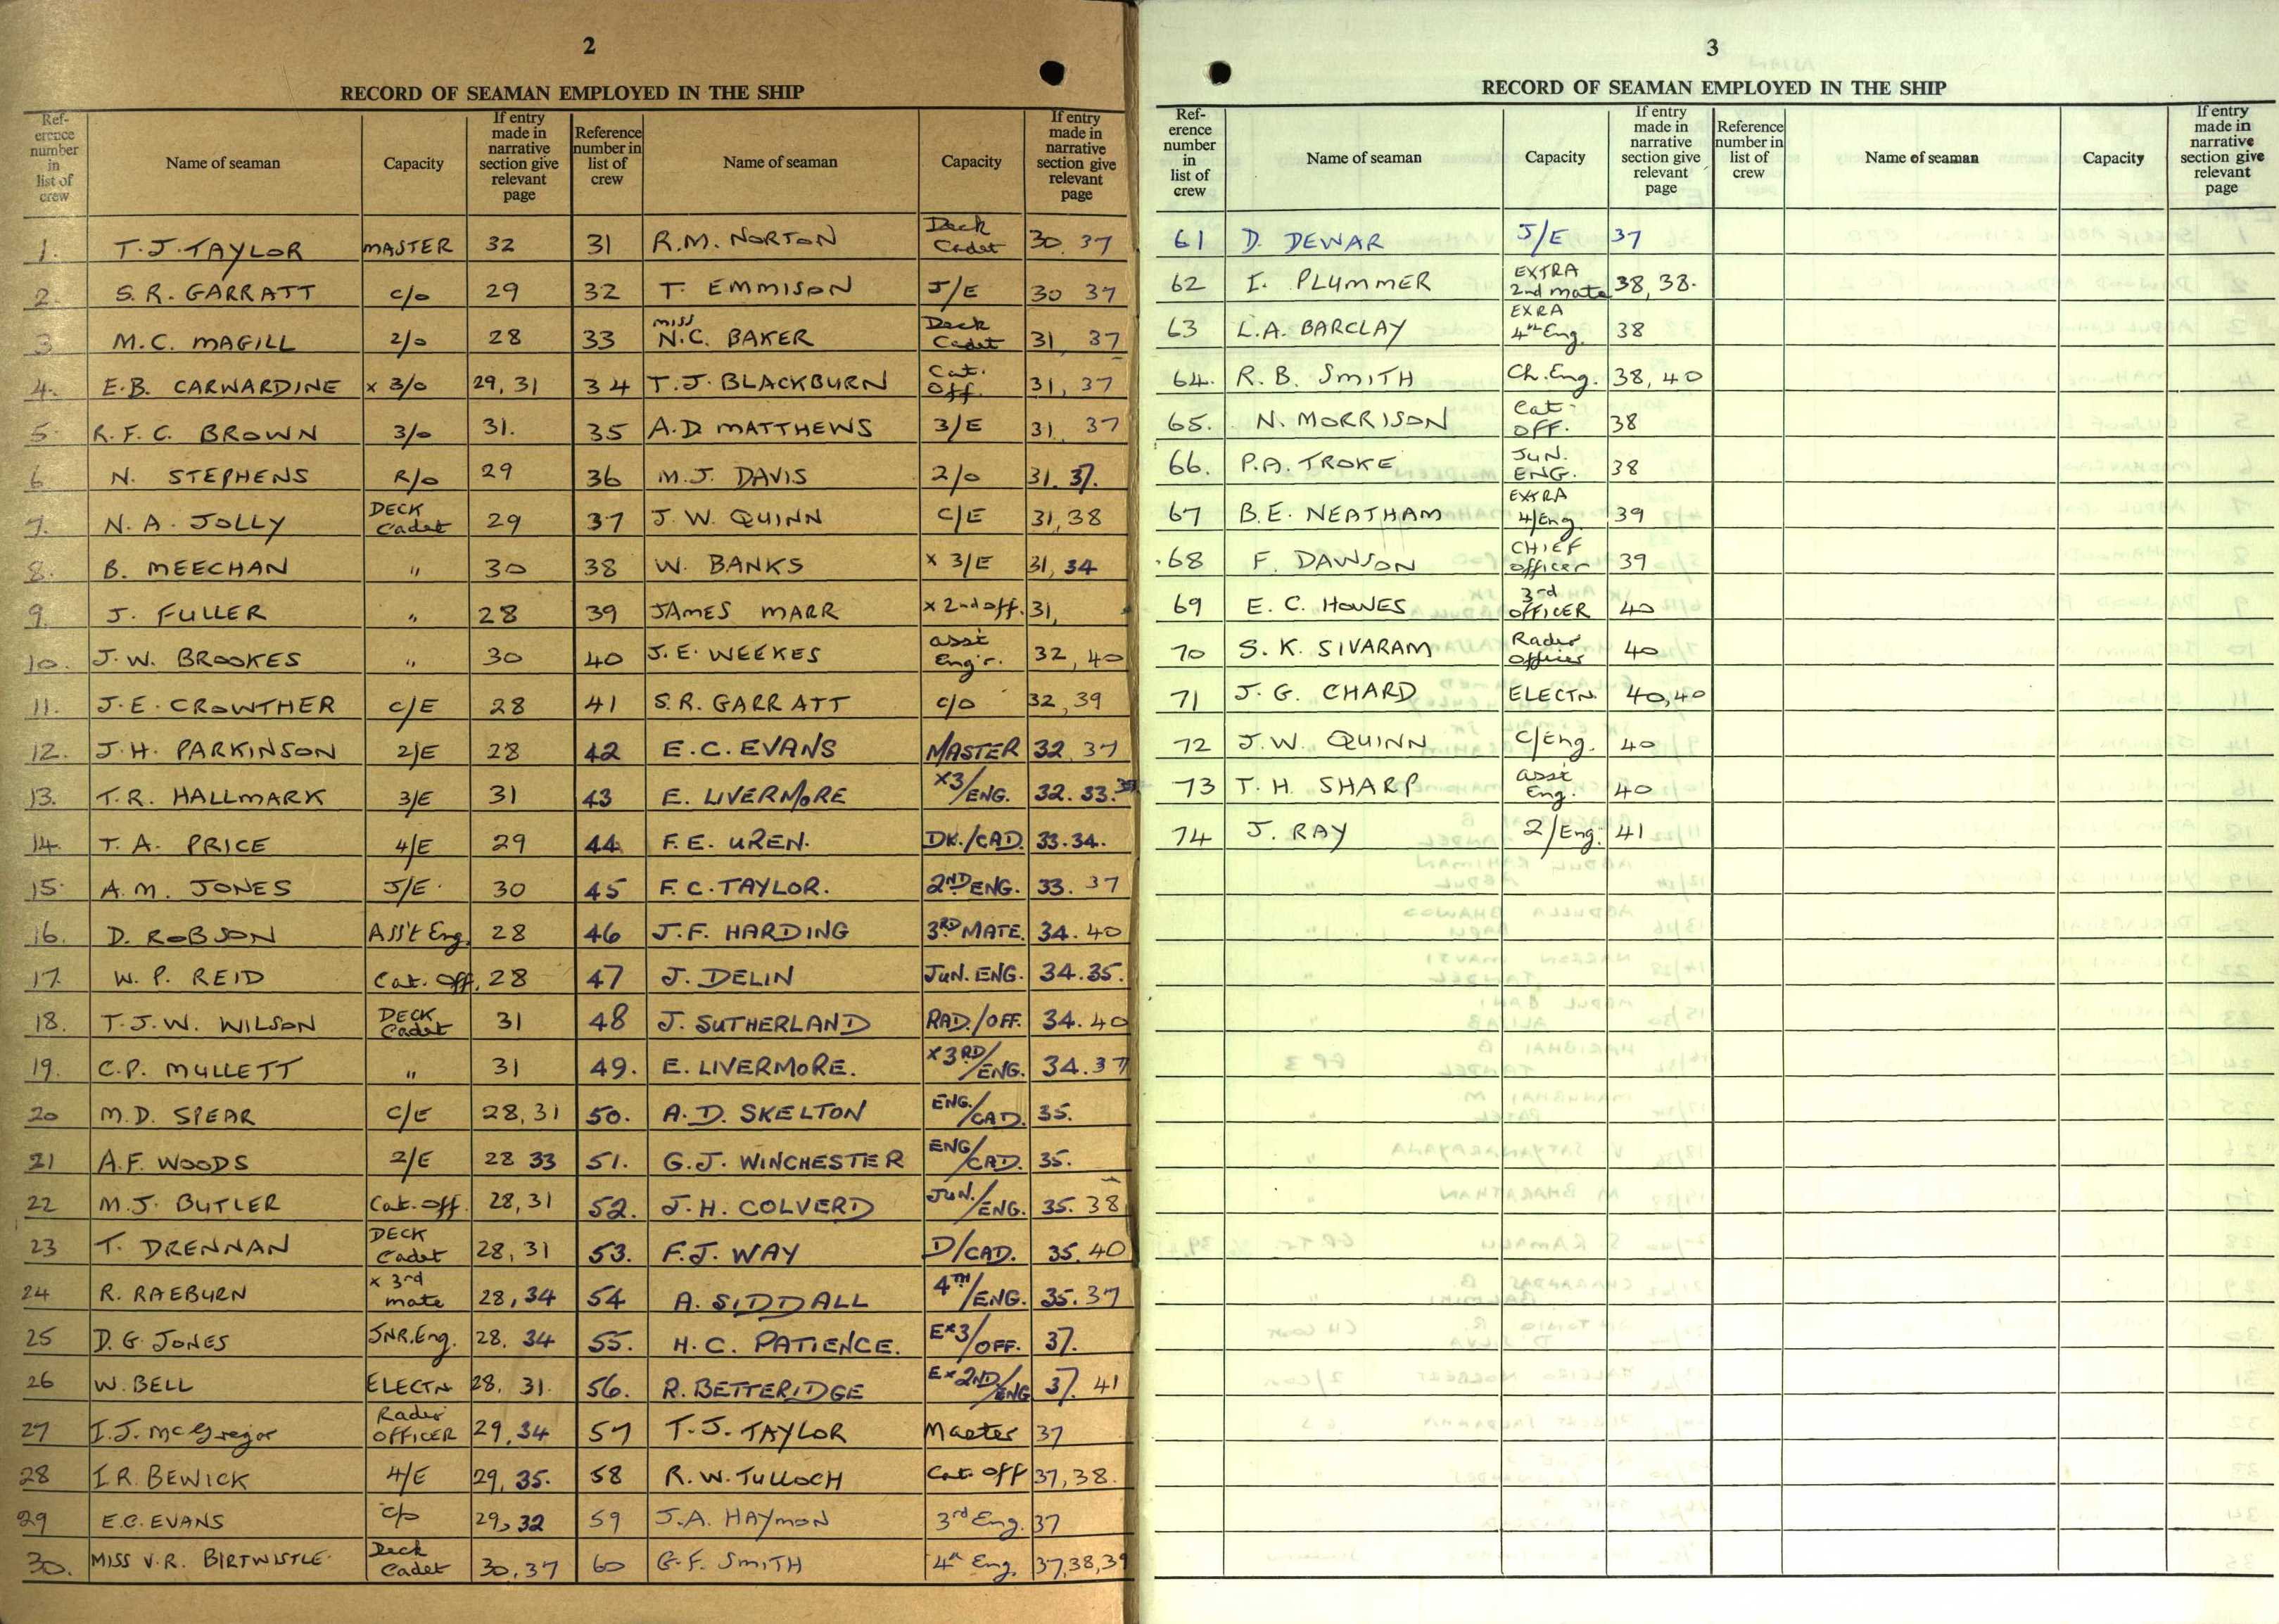 1975 Crew List for British Osprey